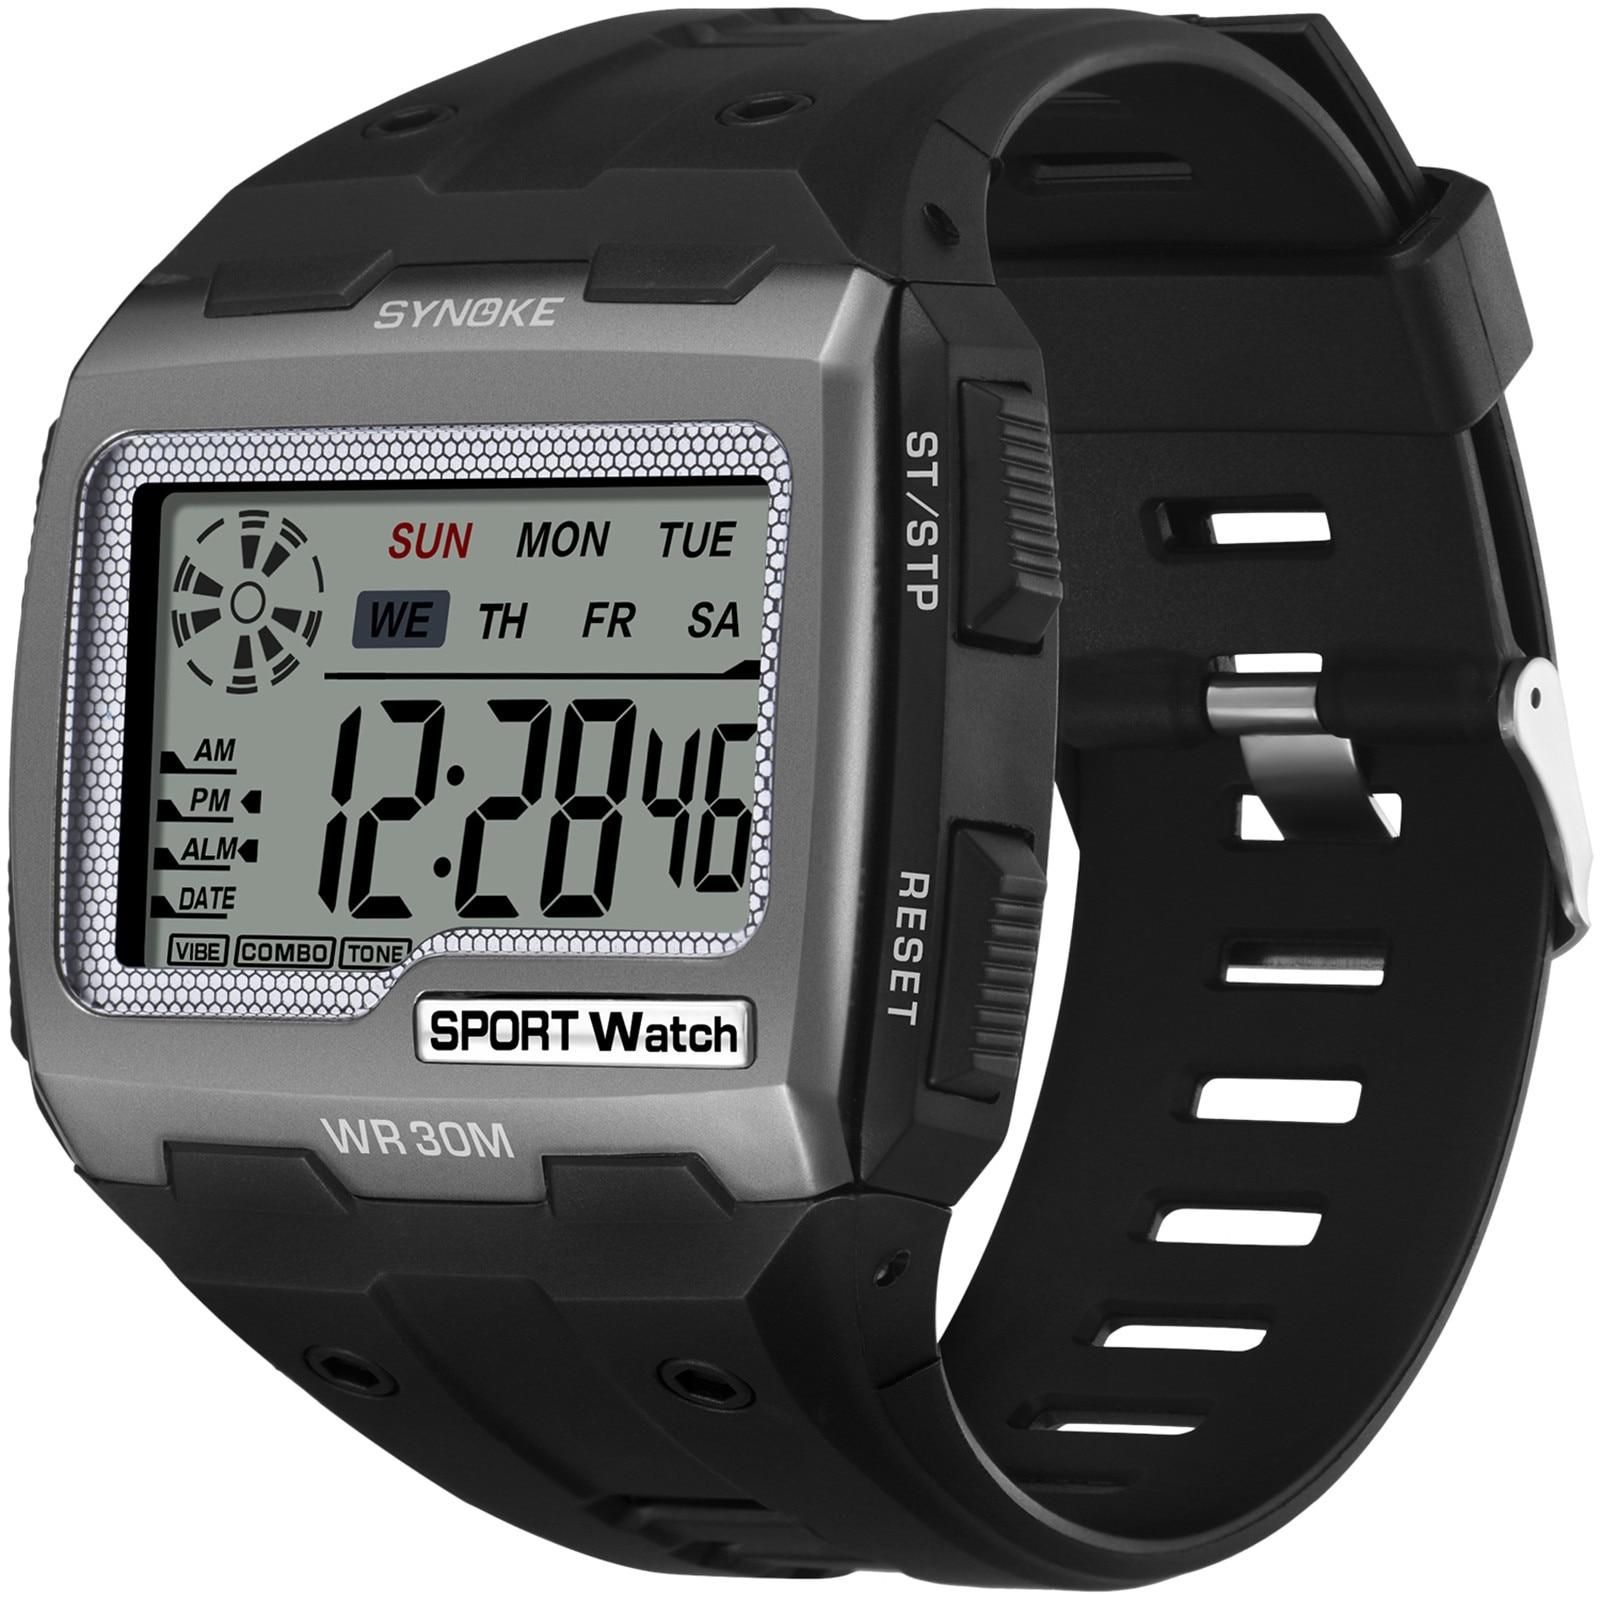 Otoky Fashion Trend Electronic Men Watch Square Led Multifunctional Sports Student Wrist Watch Light